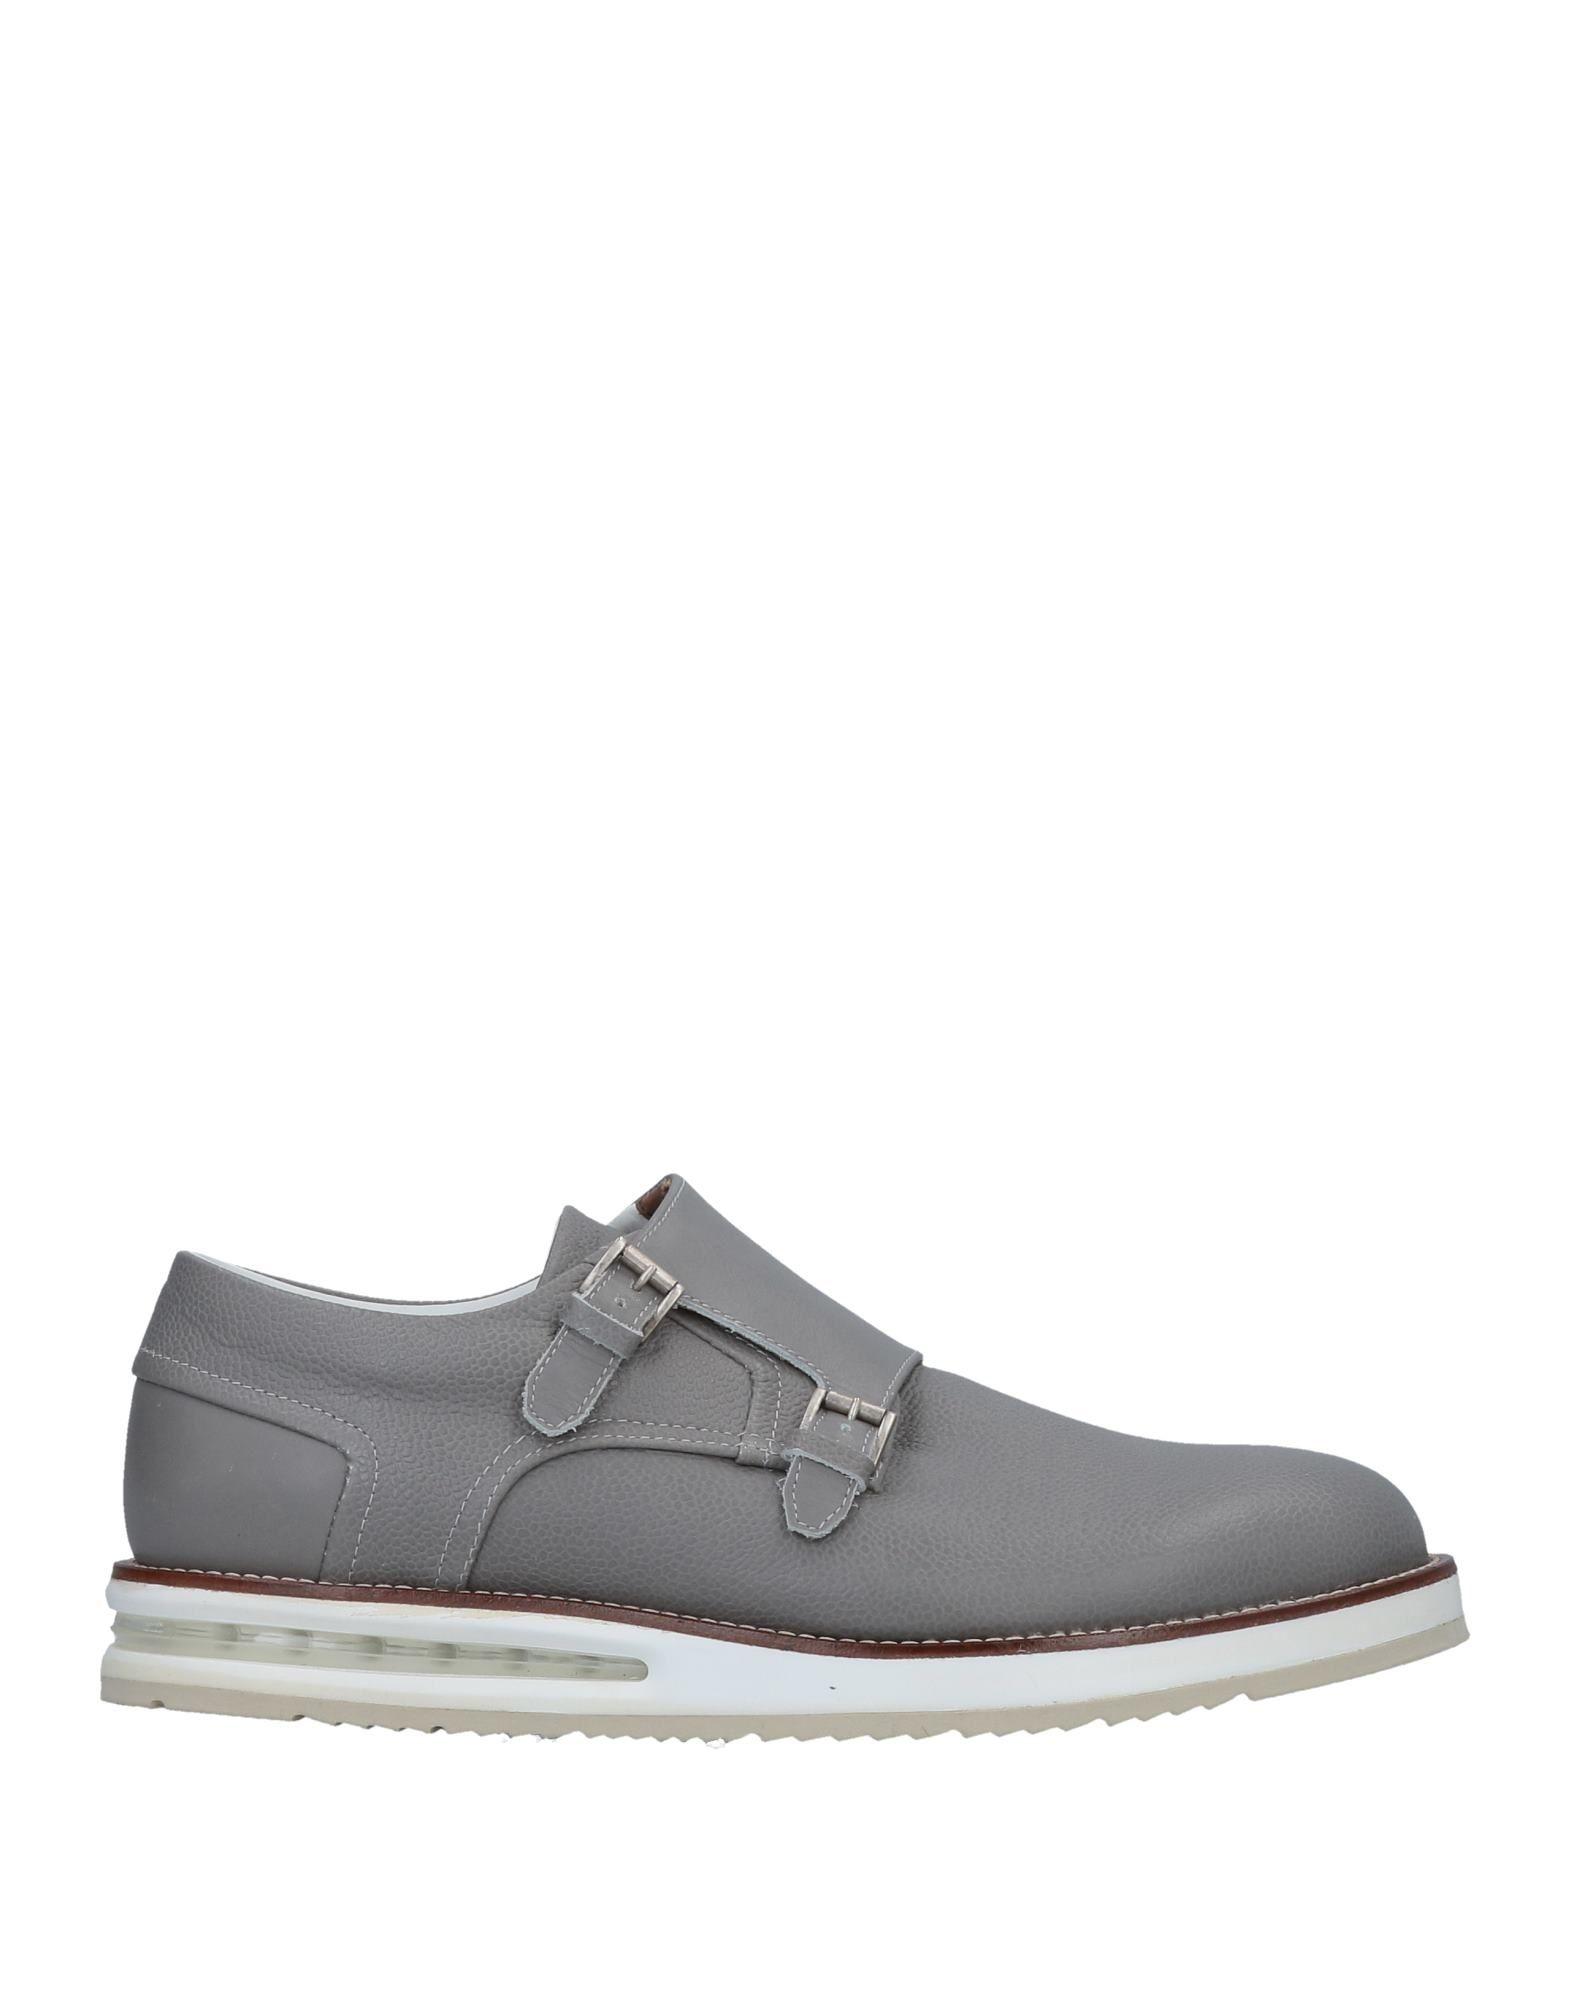 Barleycorn Mokassins Herren  beliebte 11504956TP Gute Qualität beliebte  Schuhe 01eaf0